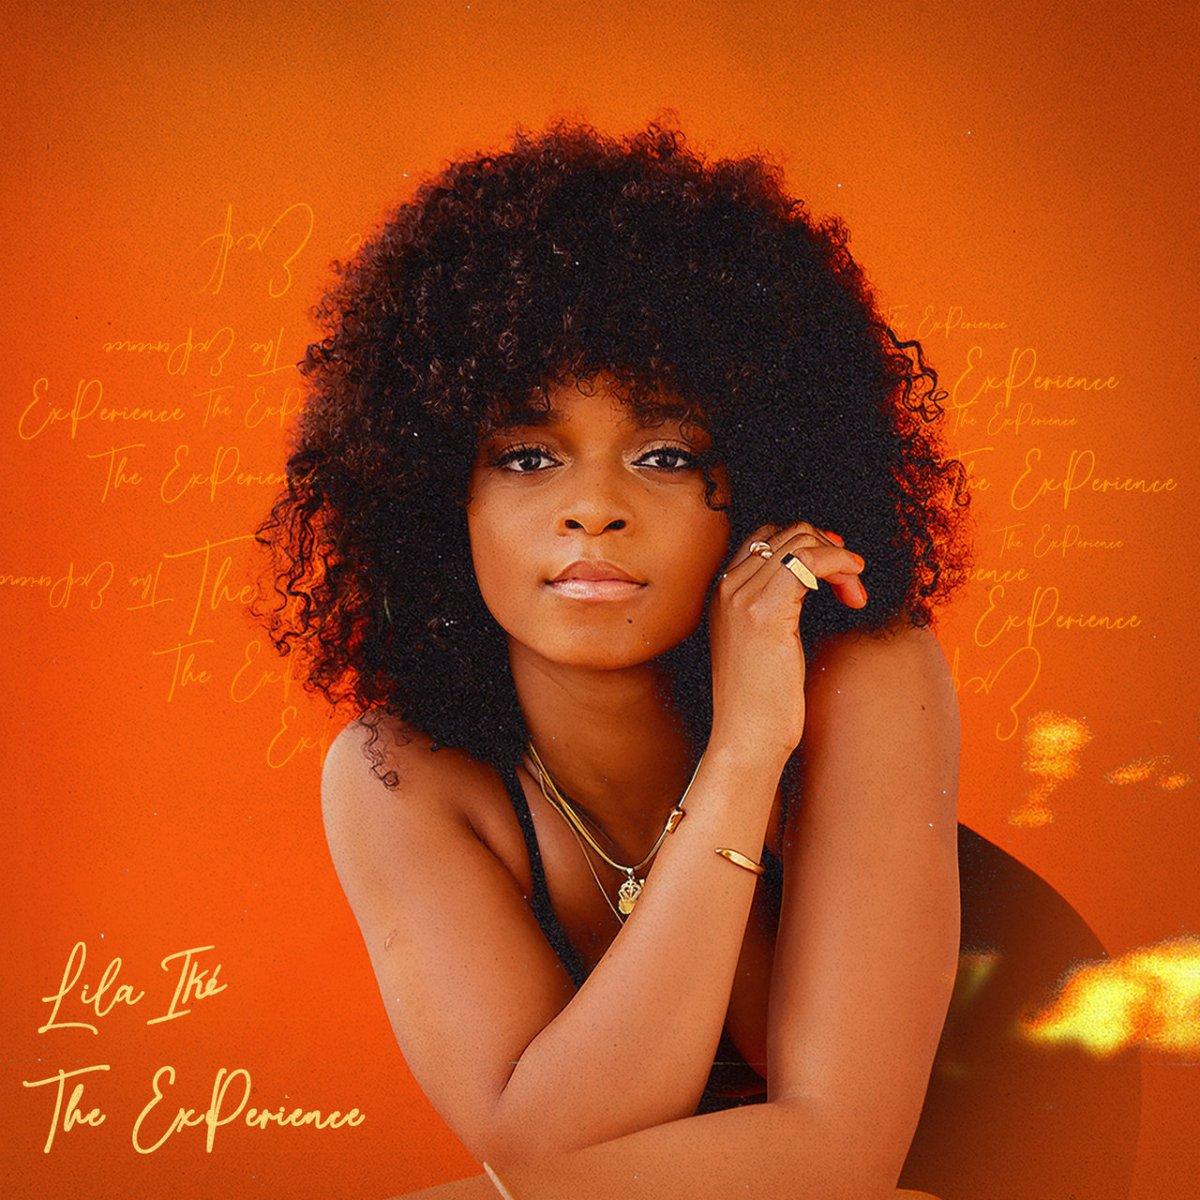 Lila Iké - The ExPerience (Cover)